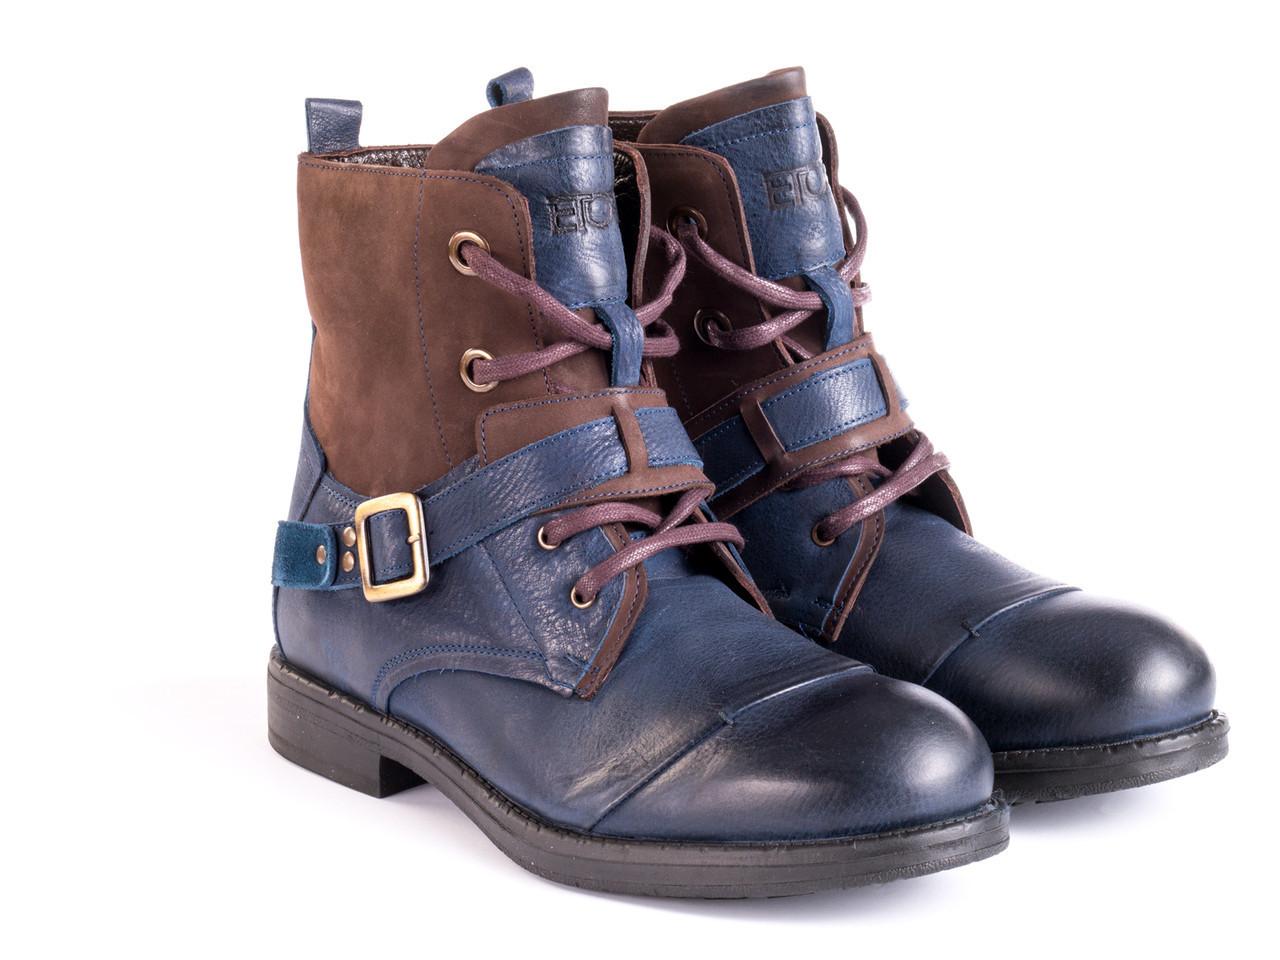 Ботинки Etor 14667-7386 44 синие